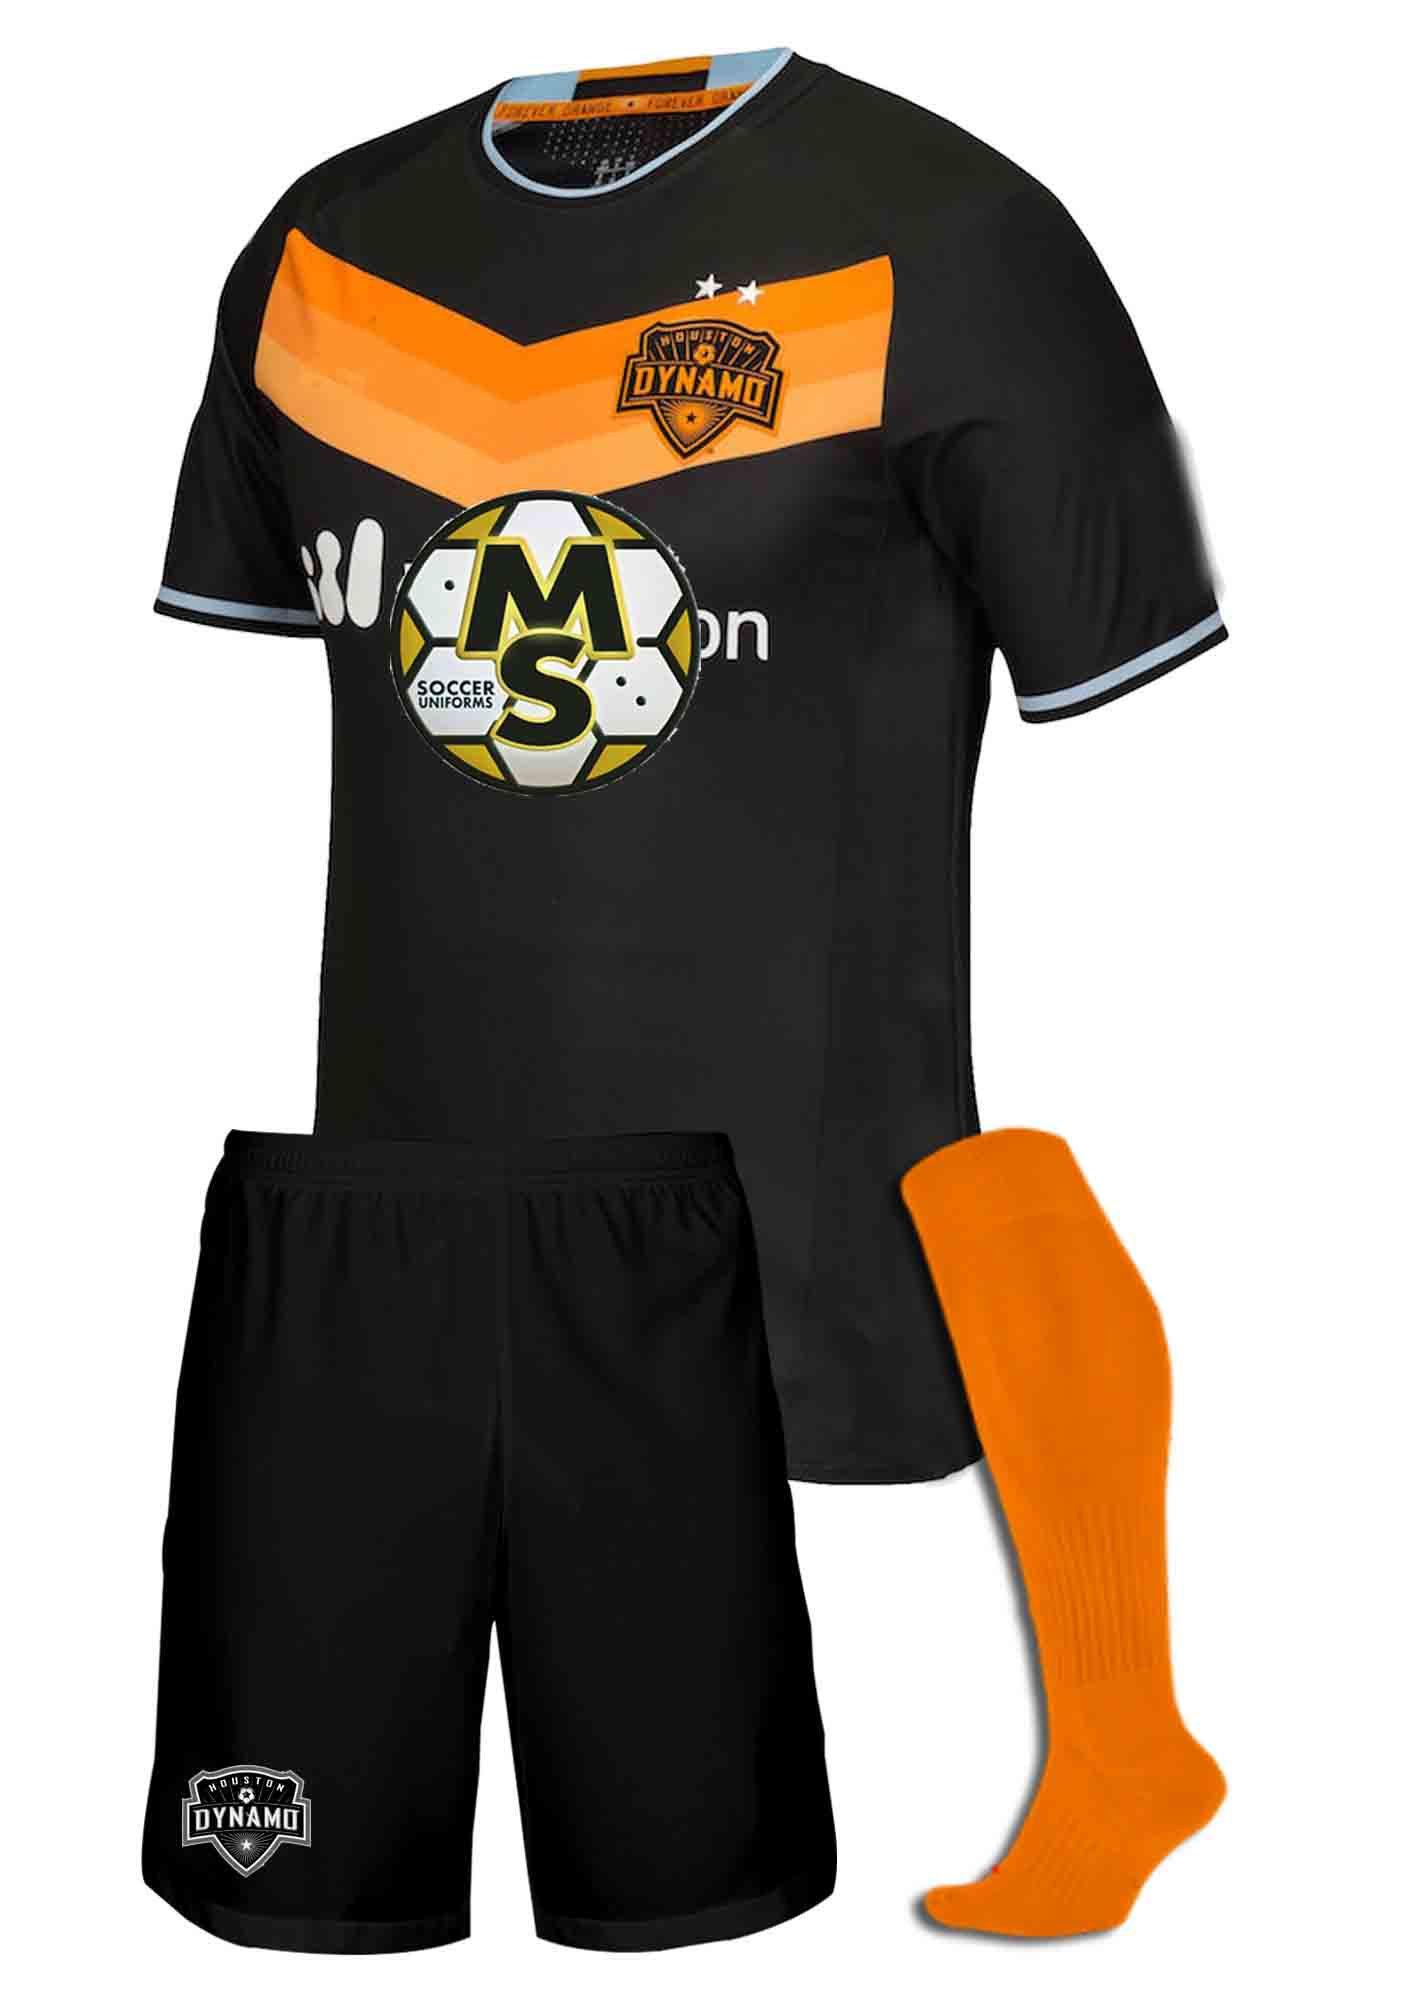 buy online acc98 459a8 Uniformes de futbol soccer Houston Dynamo 2018/2019